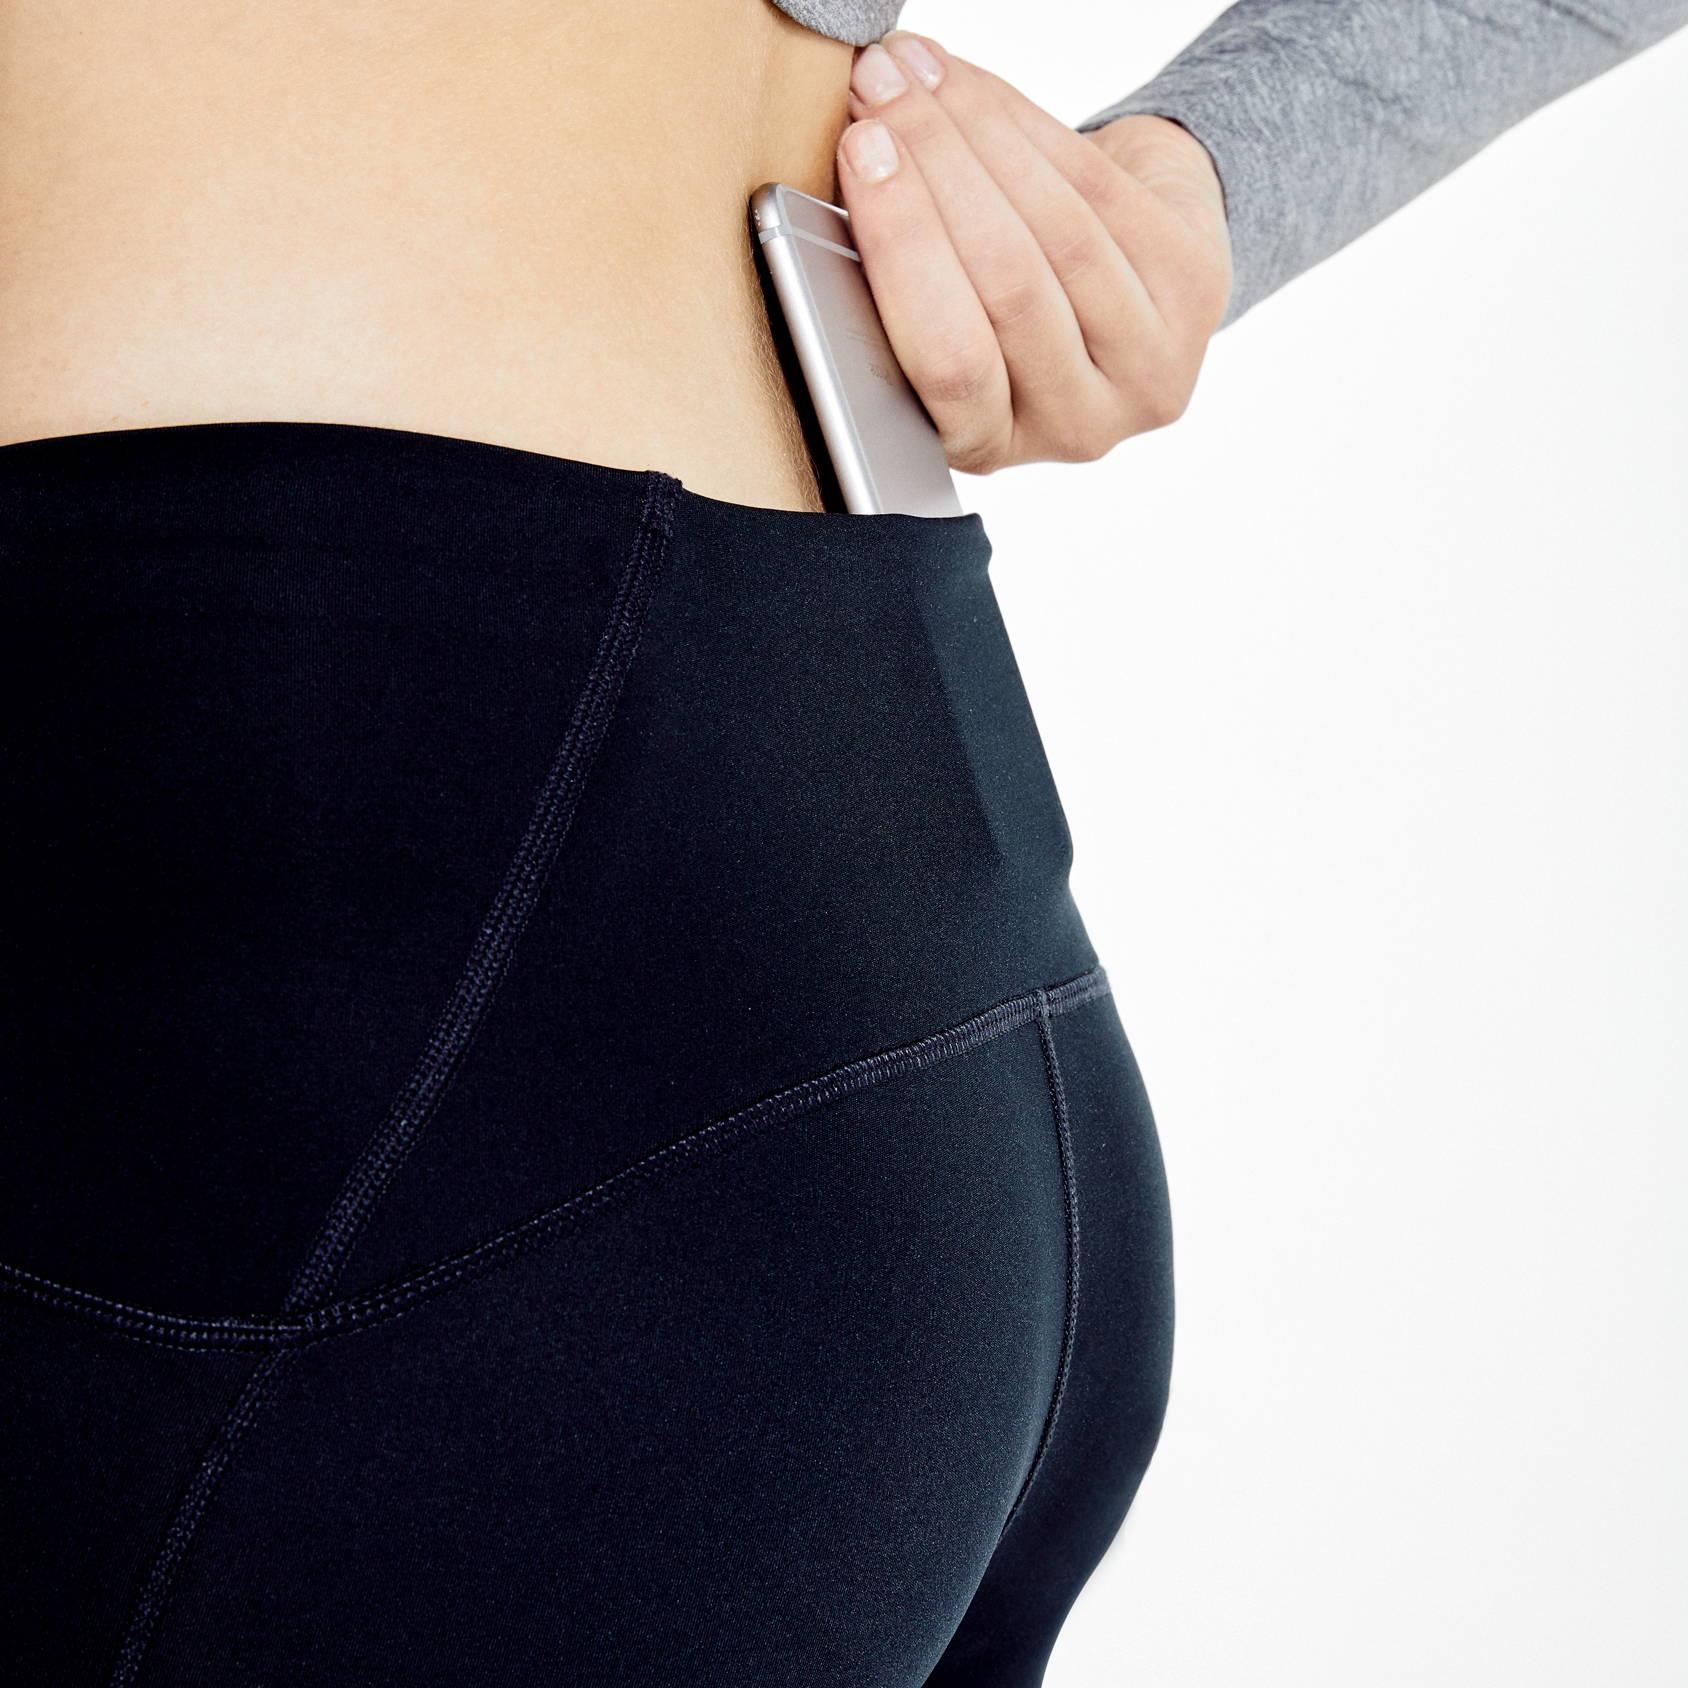 Womens-Glow-Performance-Tight-Pocket